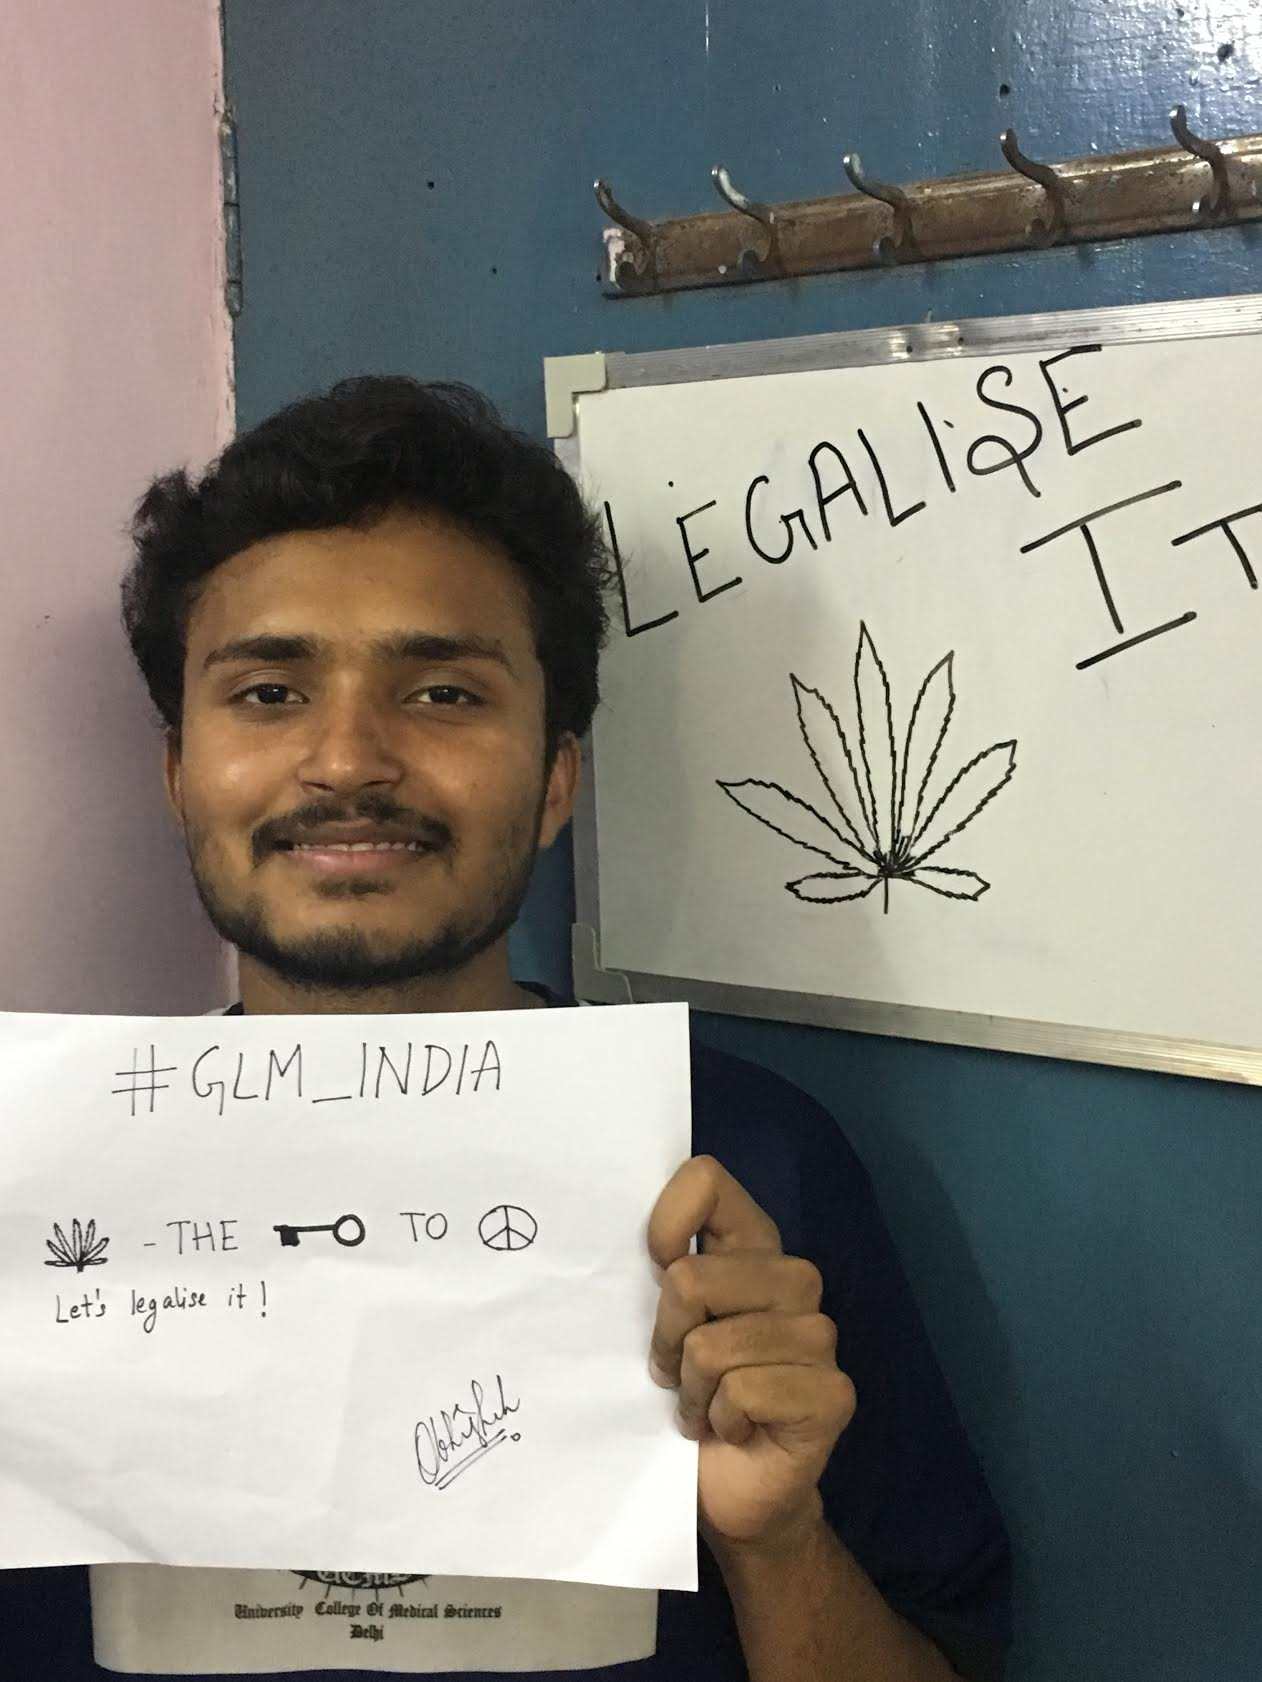 india-demands-008.jpg